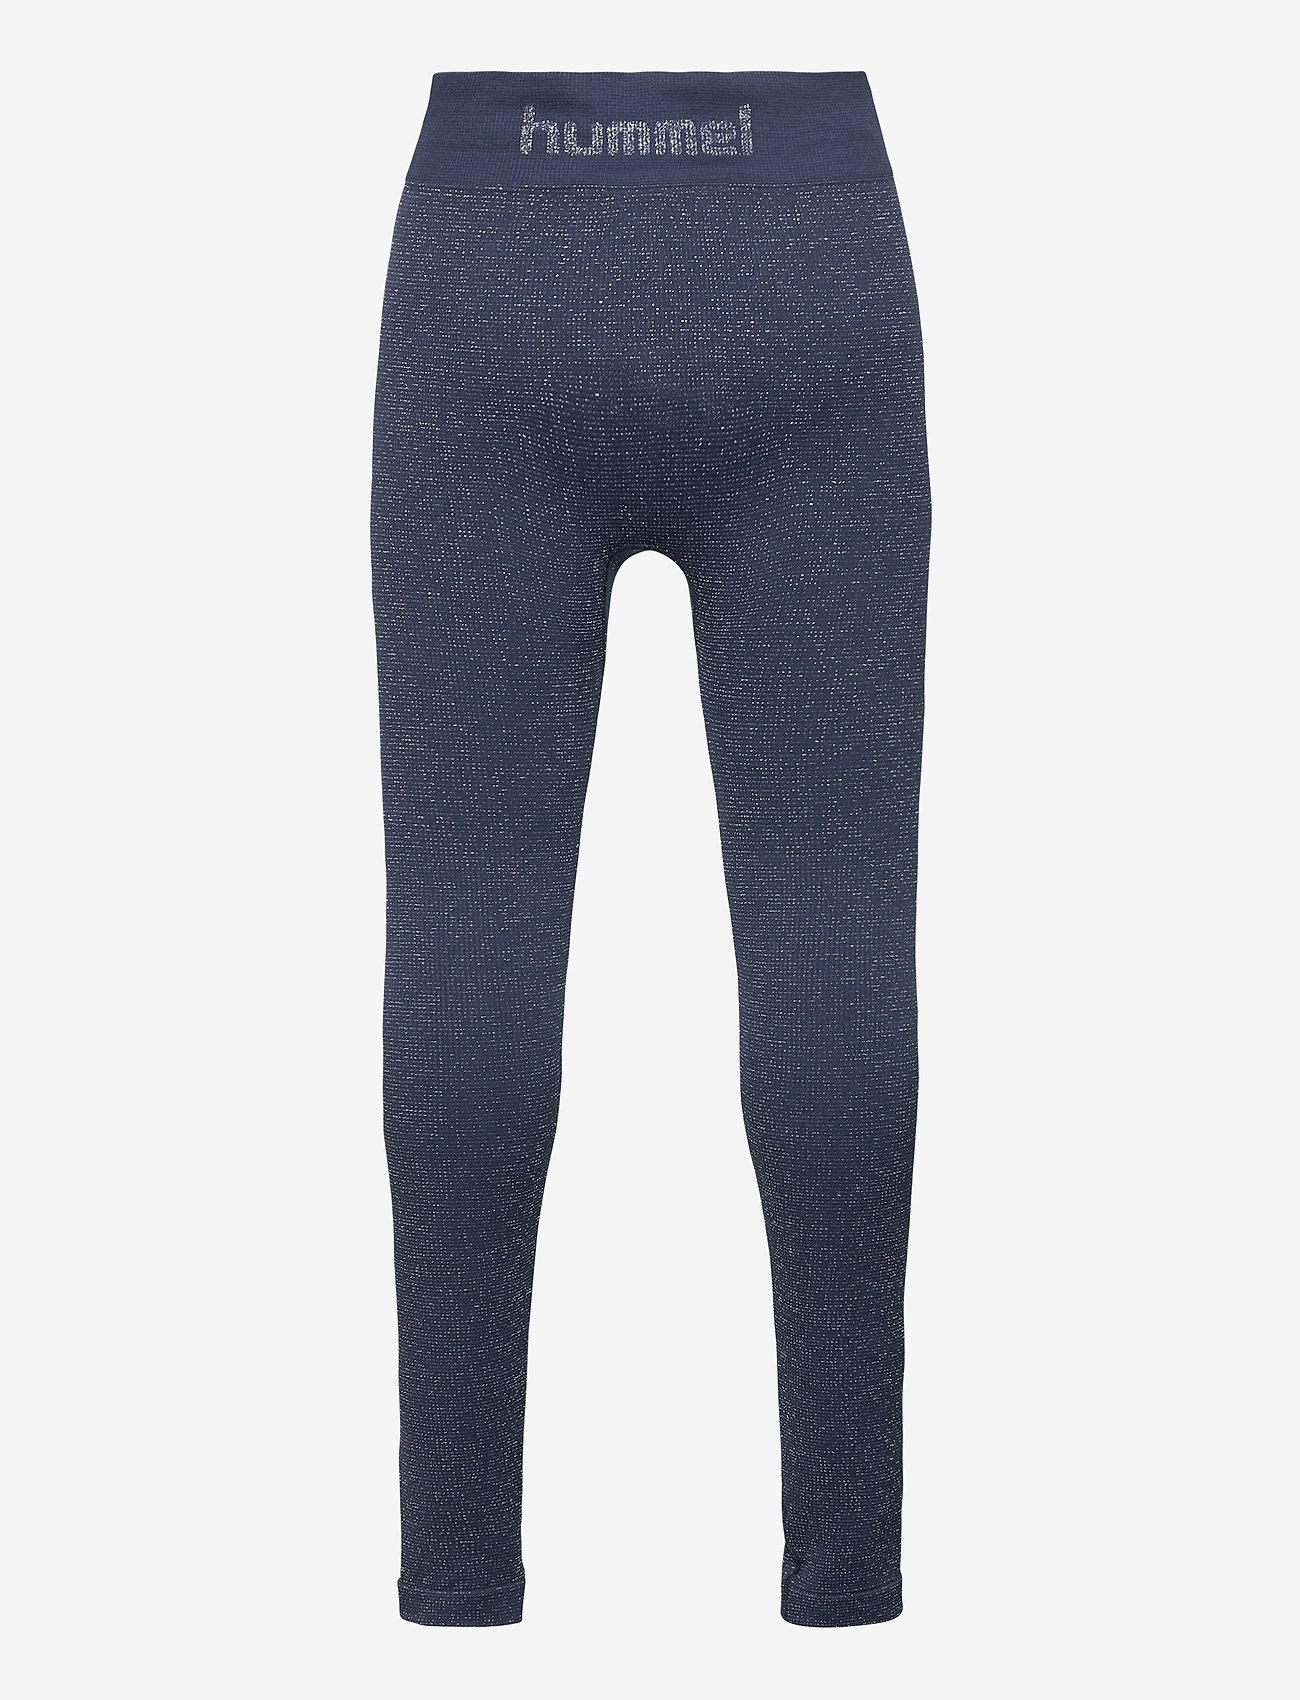 Hummel - hmlJULIA SEAMLESS TIGHTS - leggings - black iris - 1